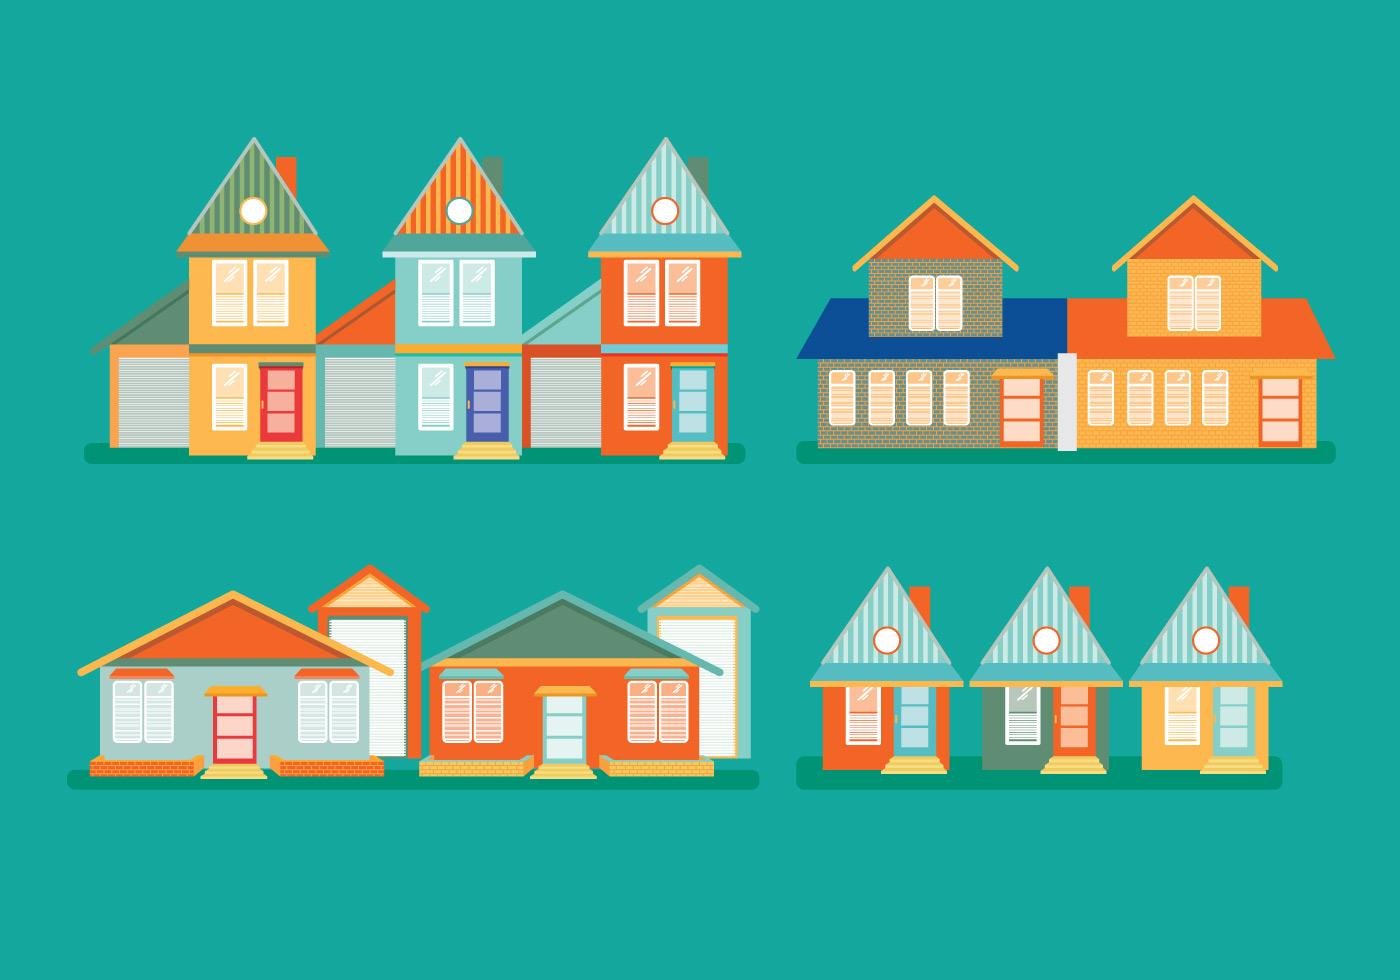 Town Landscape Vector Illustration: Download Free Vector Art, Stock